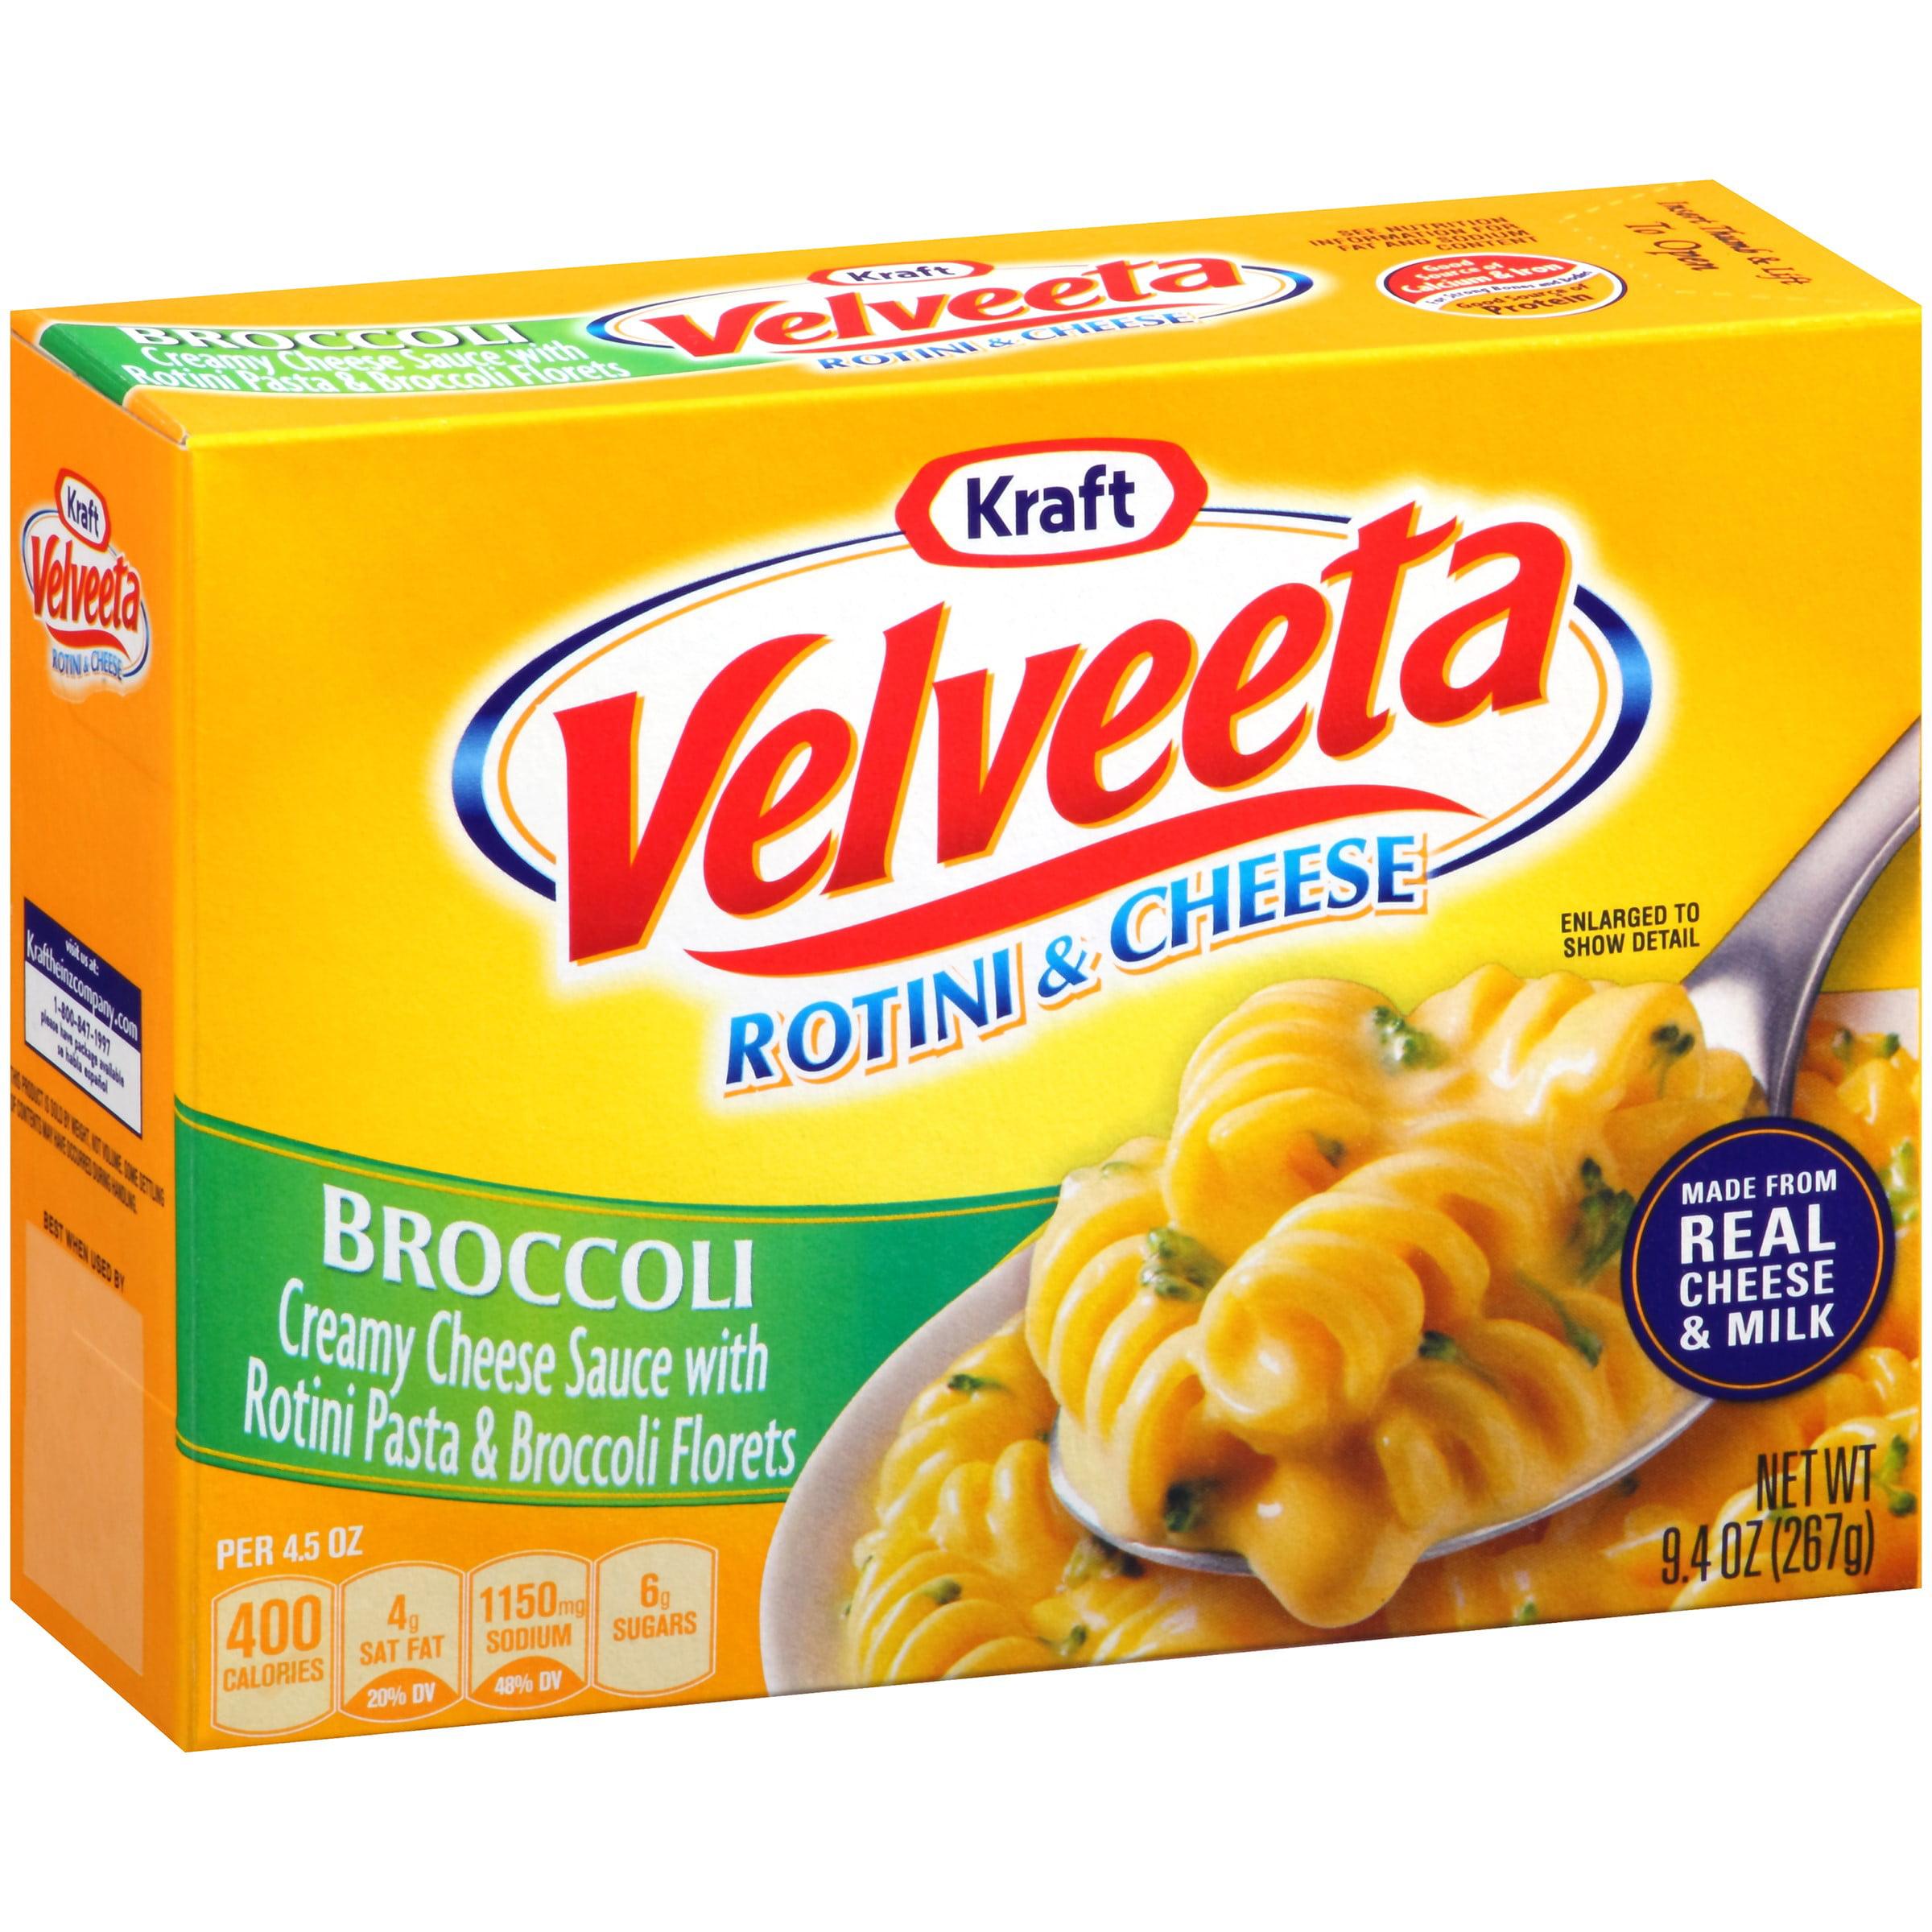 Kraft Velveeta Broccoli Rotini & Cheese 9.4 oz. Box by Kraft